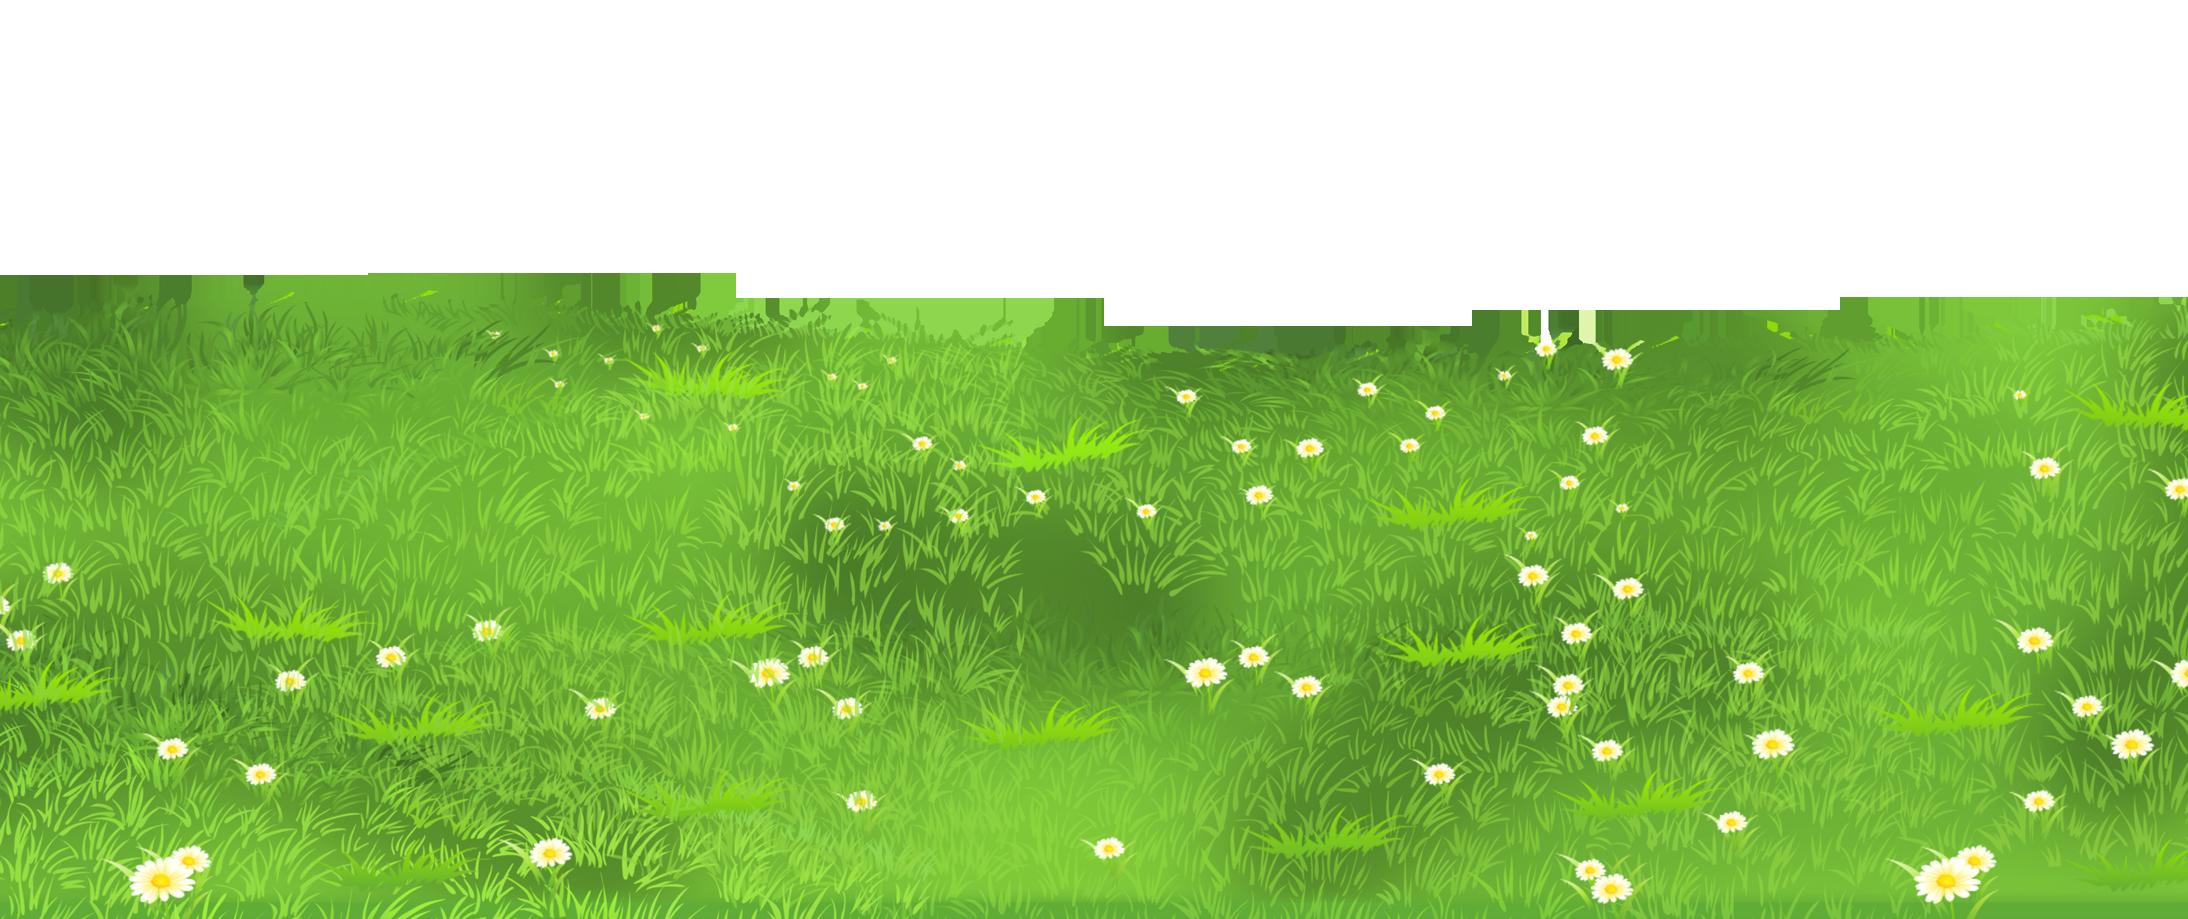 Grass image diversos pinterest. Pathway clipart green design